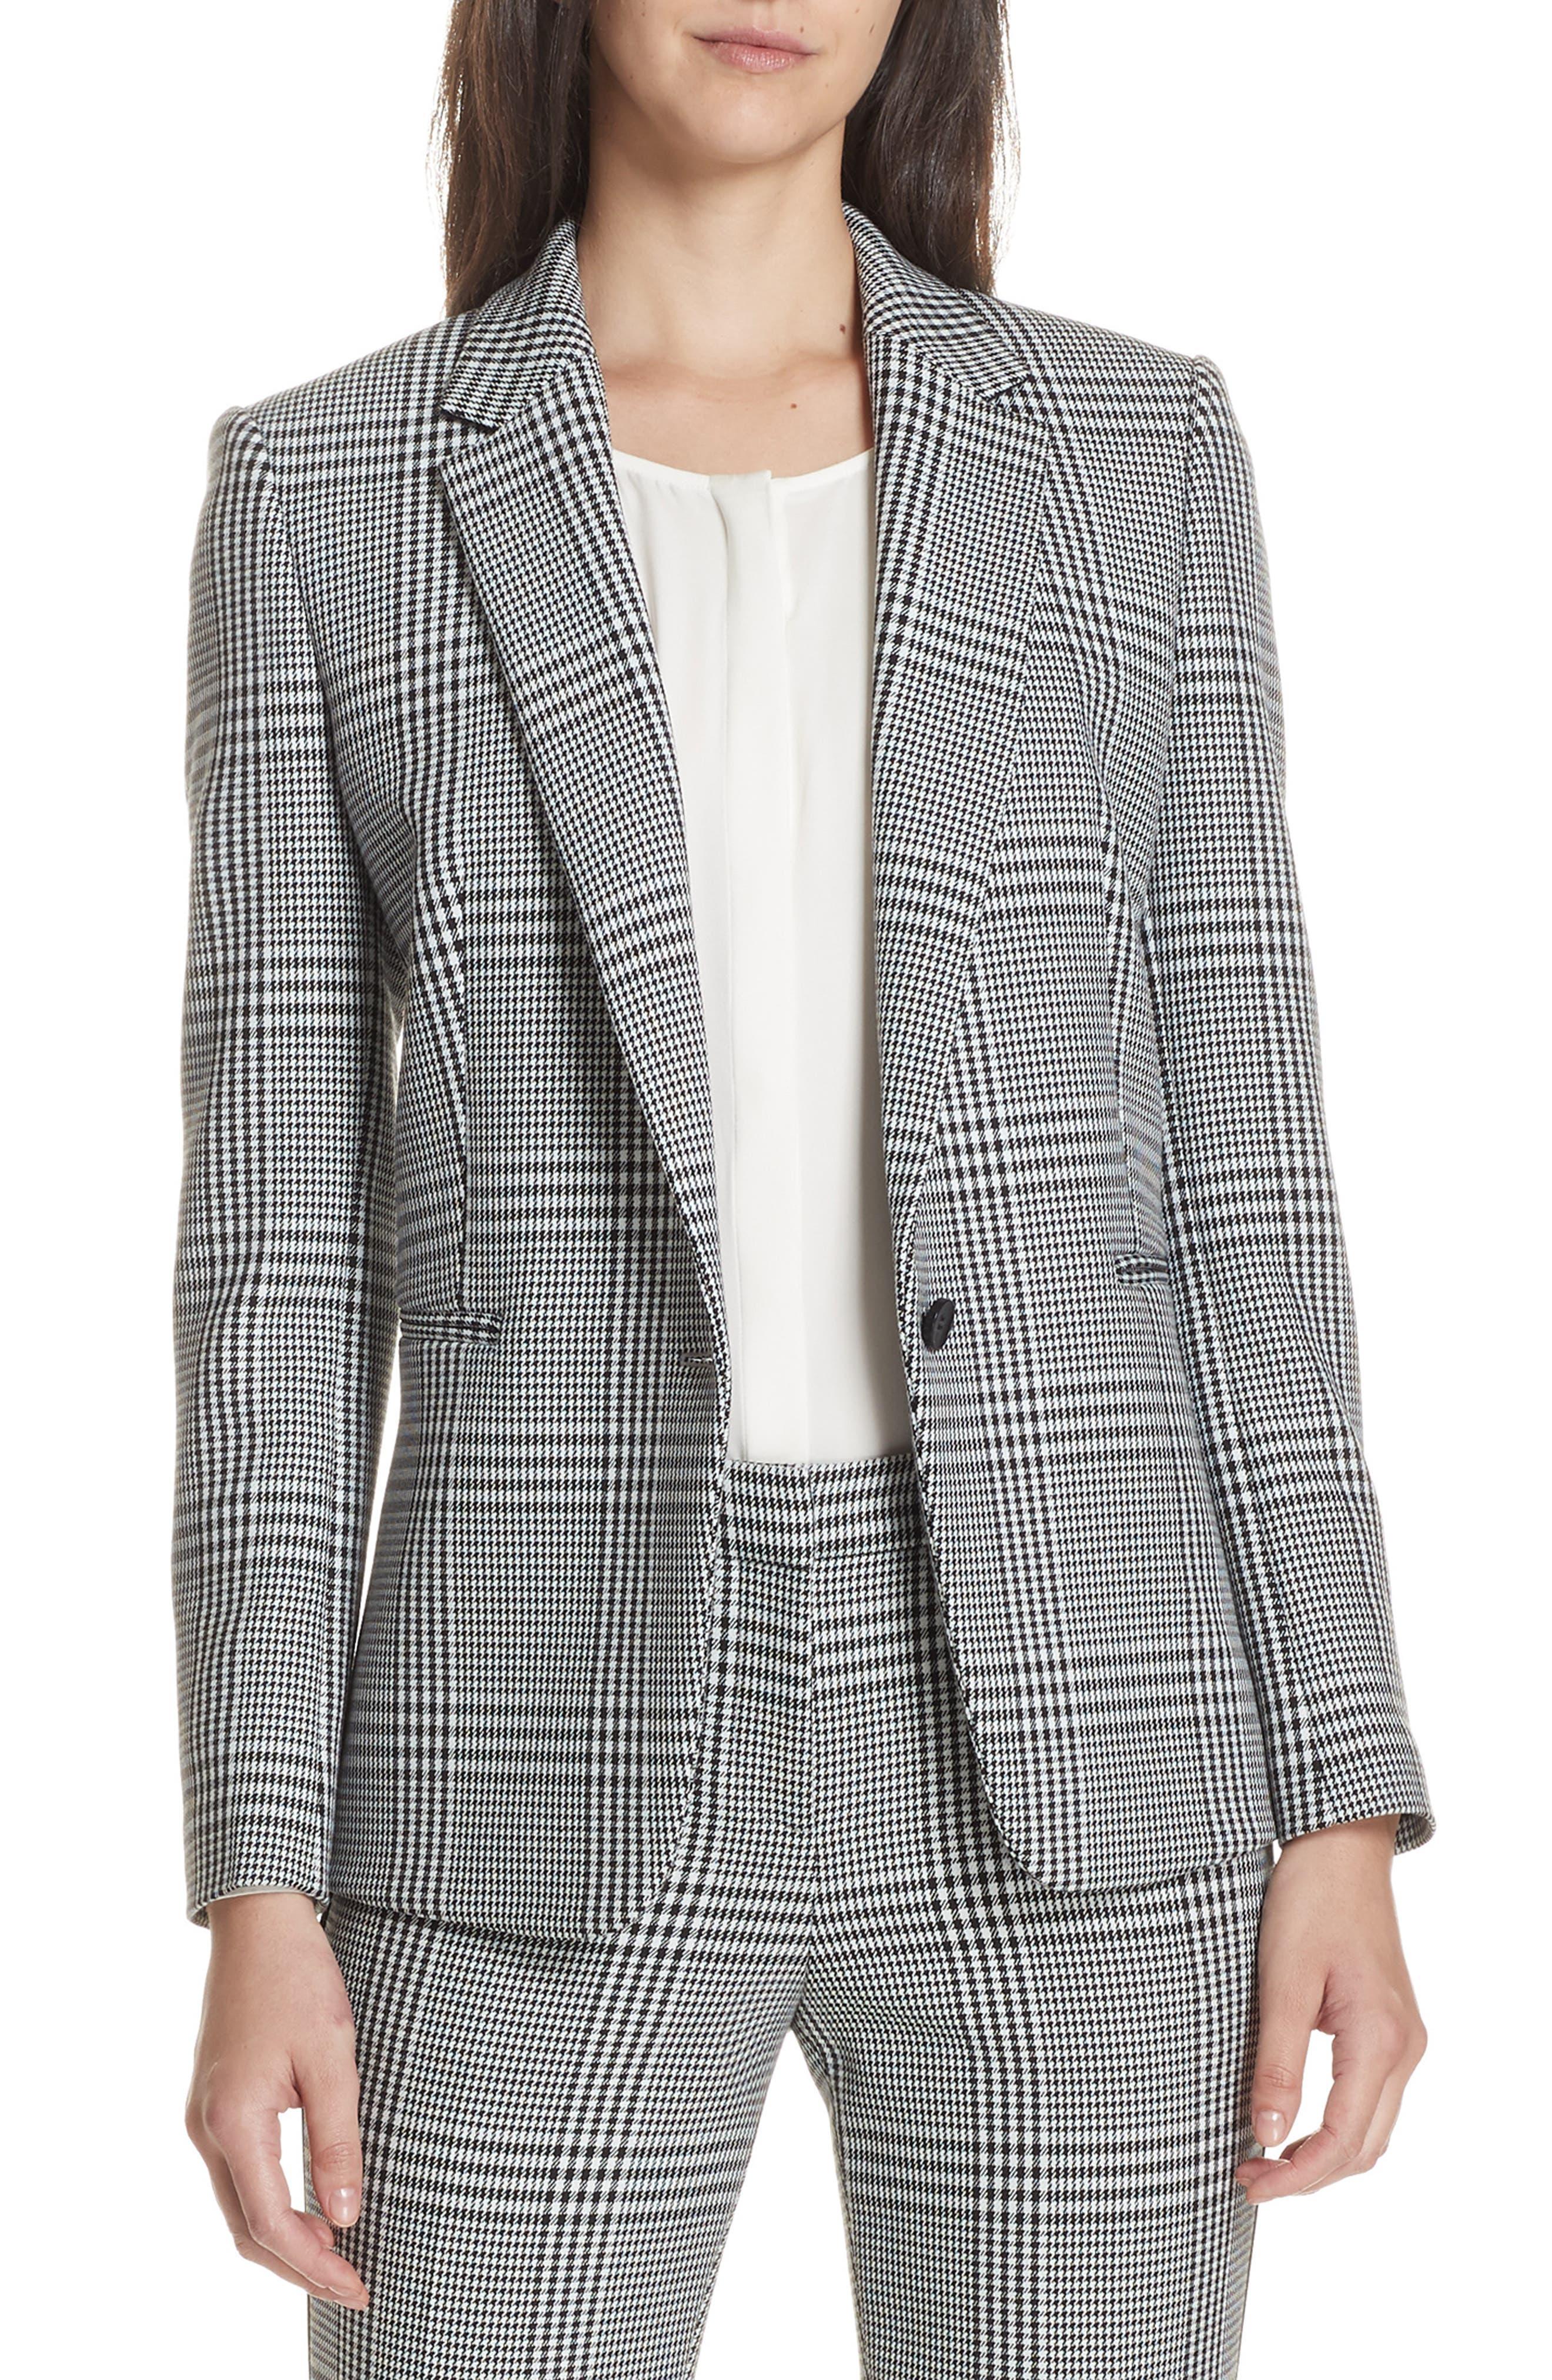 Jemaromina Glen Plaid Suit Jacket,                         Main,                         color, GLENCHECK FANTASY